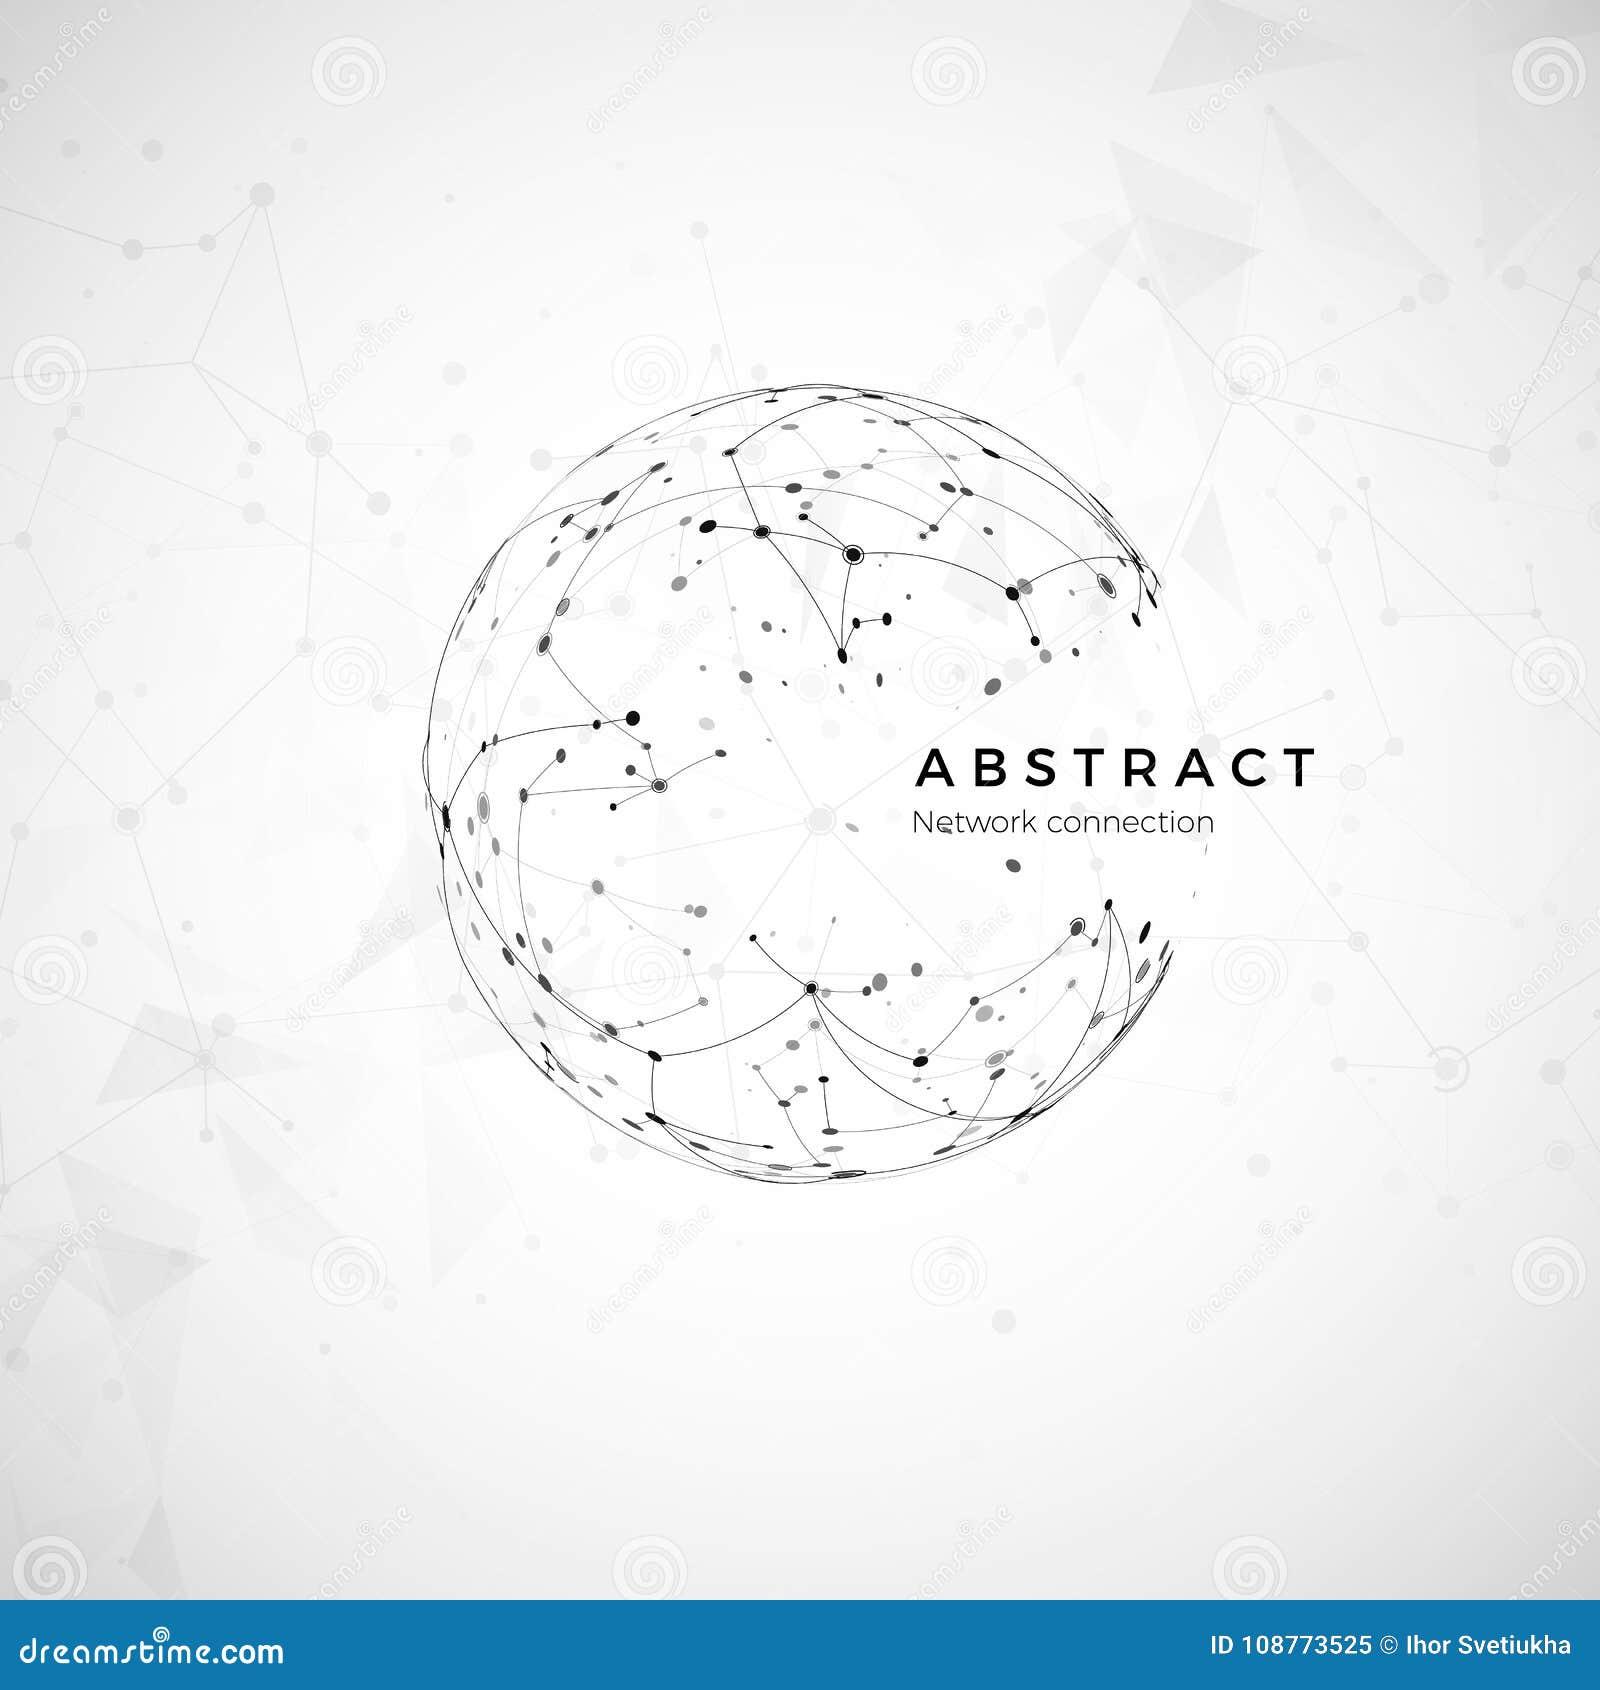 Abstraktes globales Netz Knoten und Kommunikation Kugeldigitales Nettomodellieren Sozialcomputerstruktur Vektor